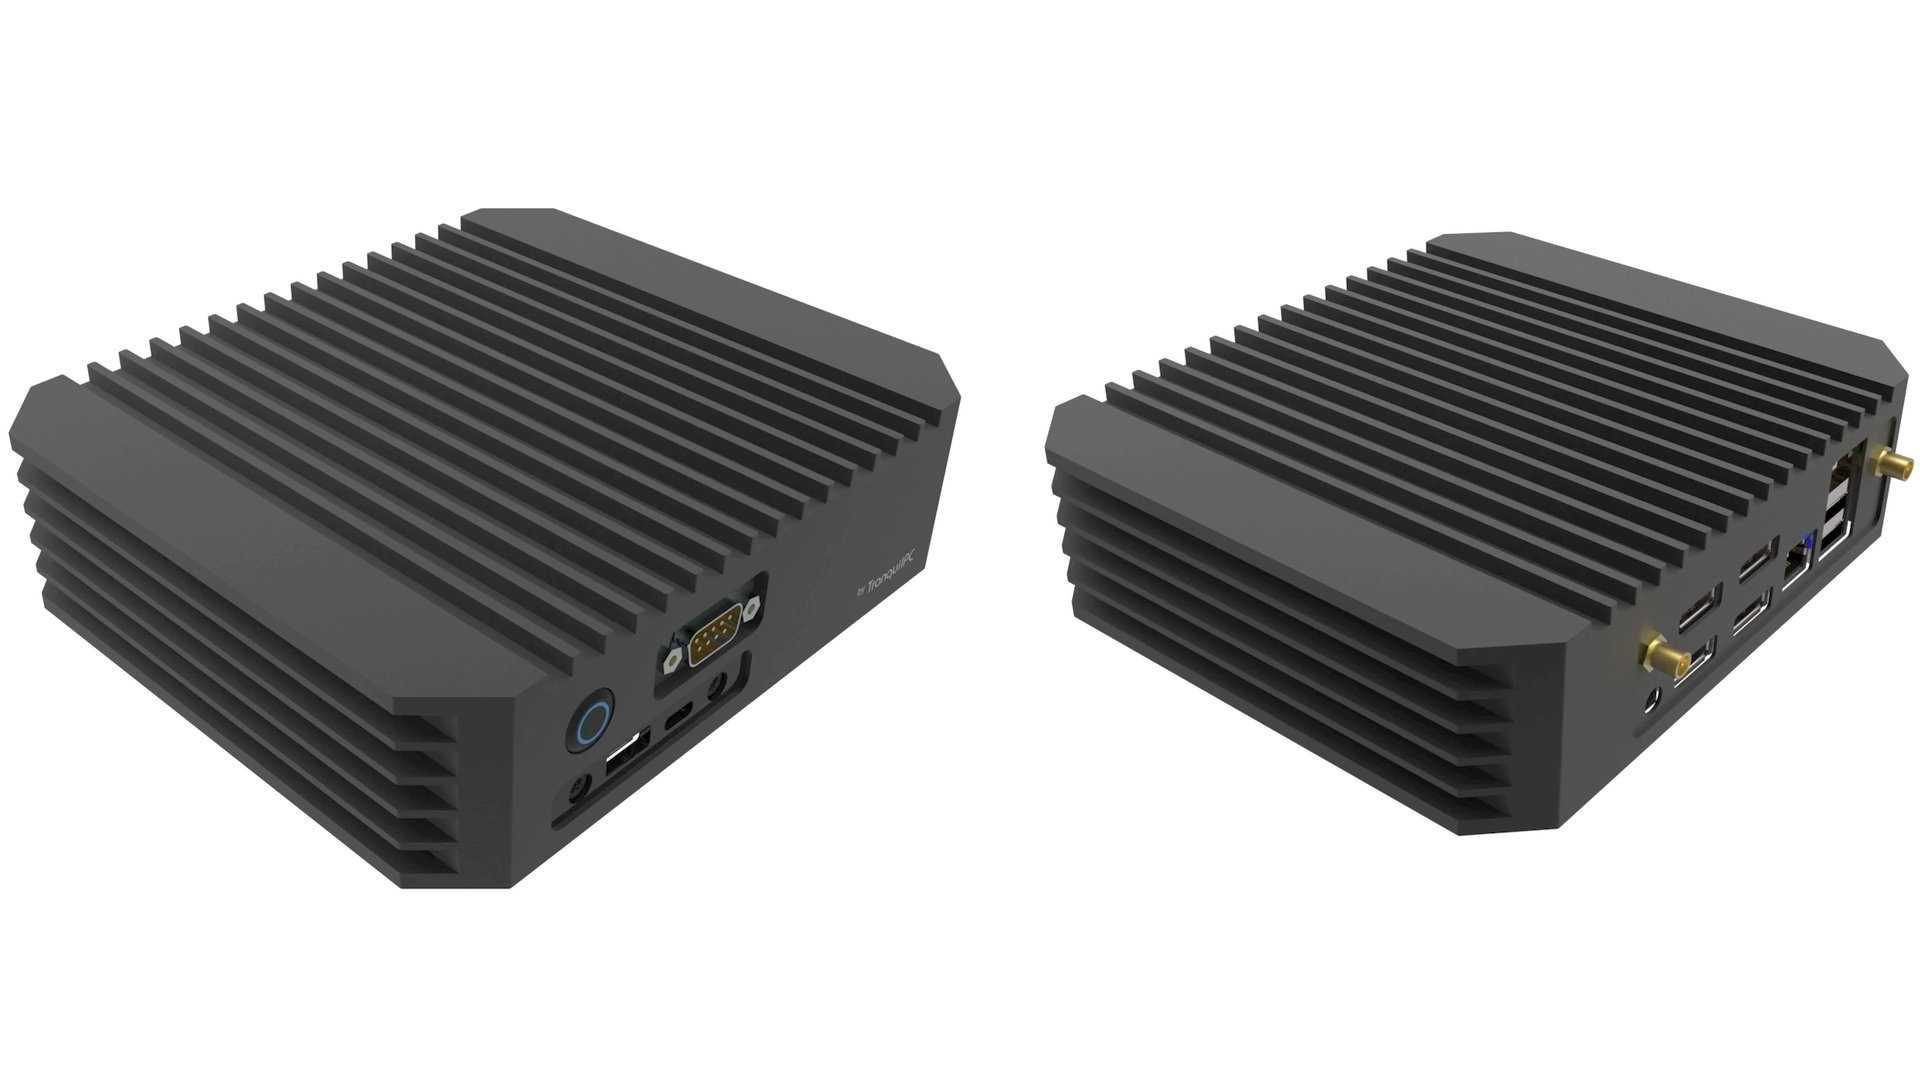 Tranquil PC Mini Multi Display PC mit AMD Ryzen Embedded V1000